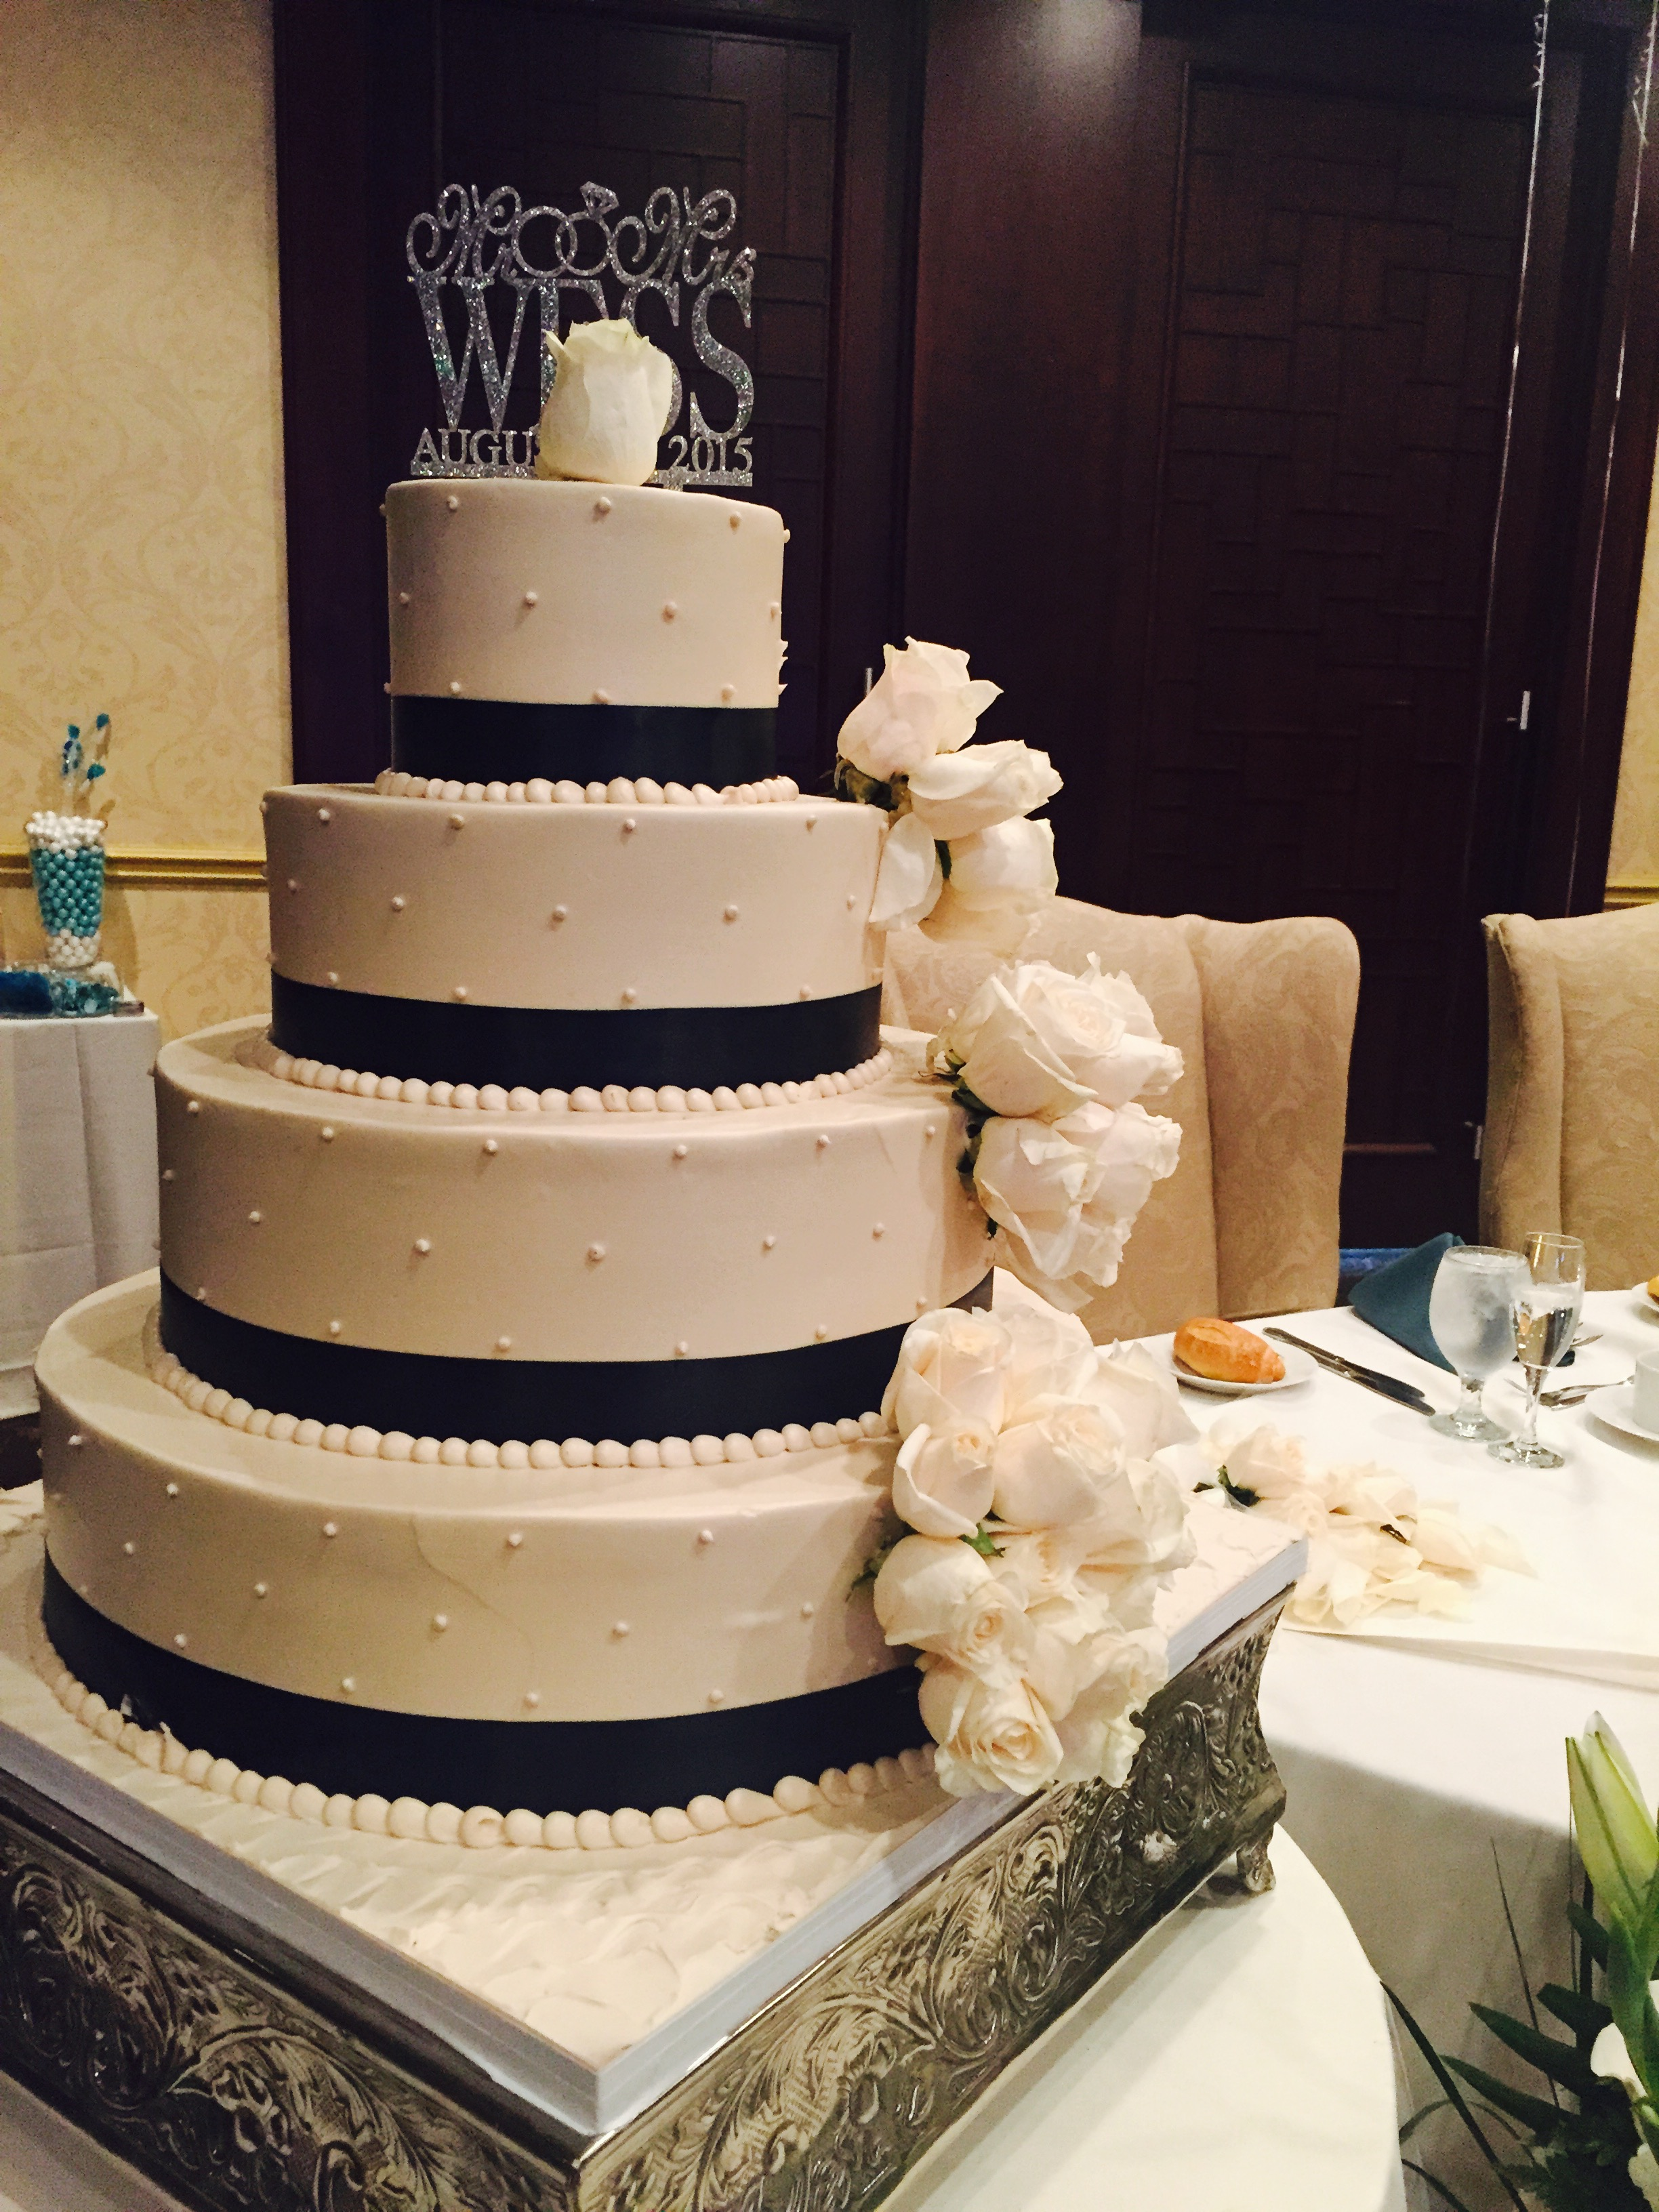 Palermos Cake.jpg